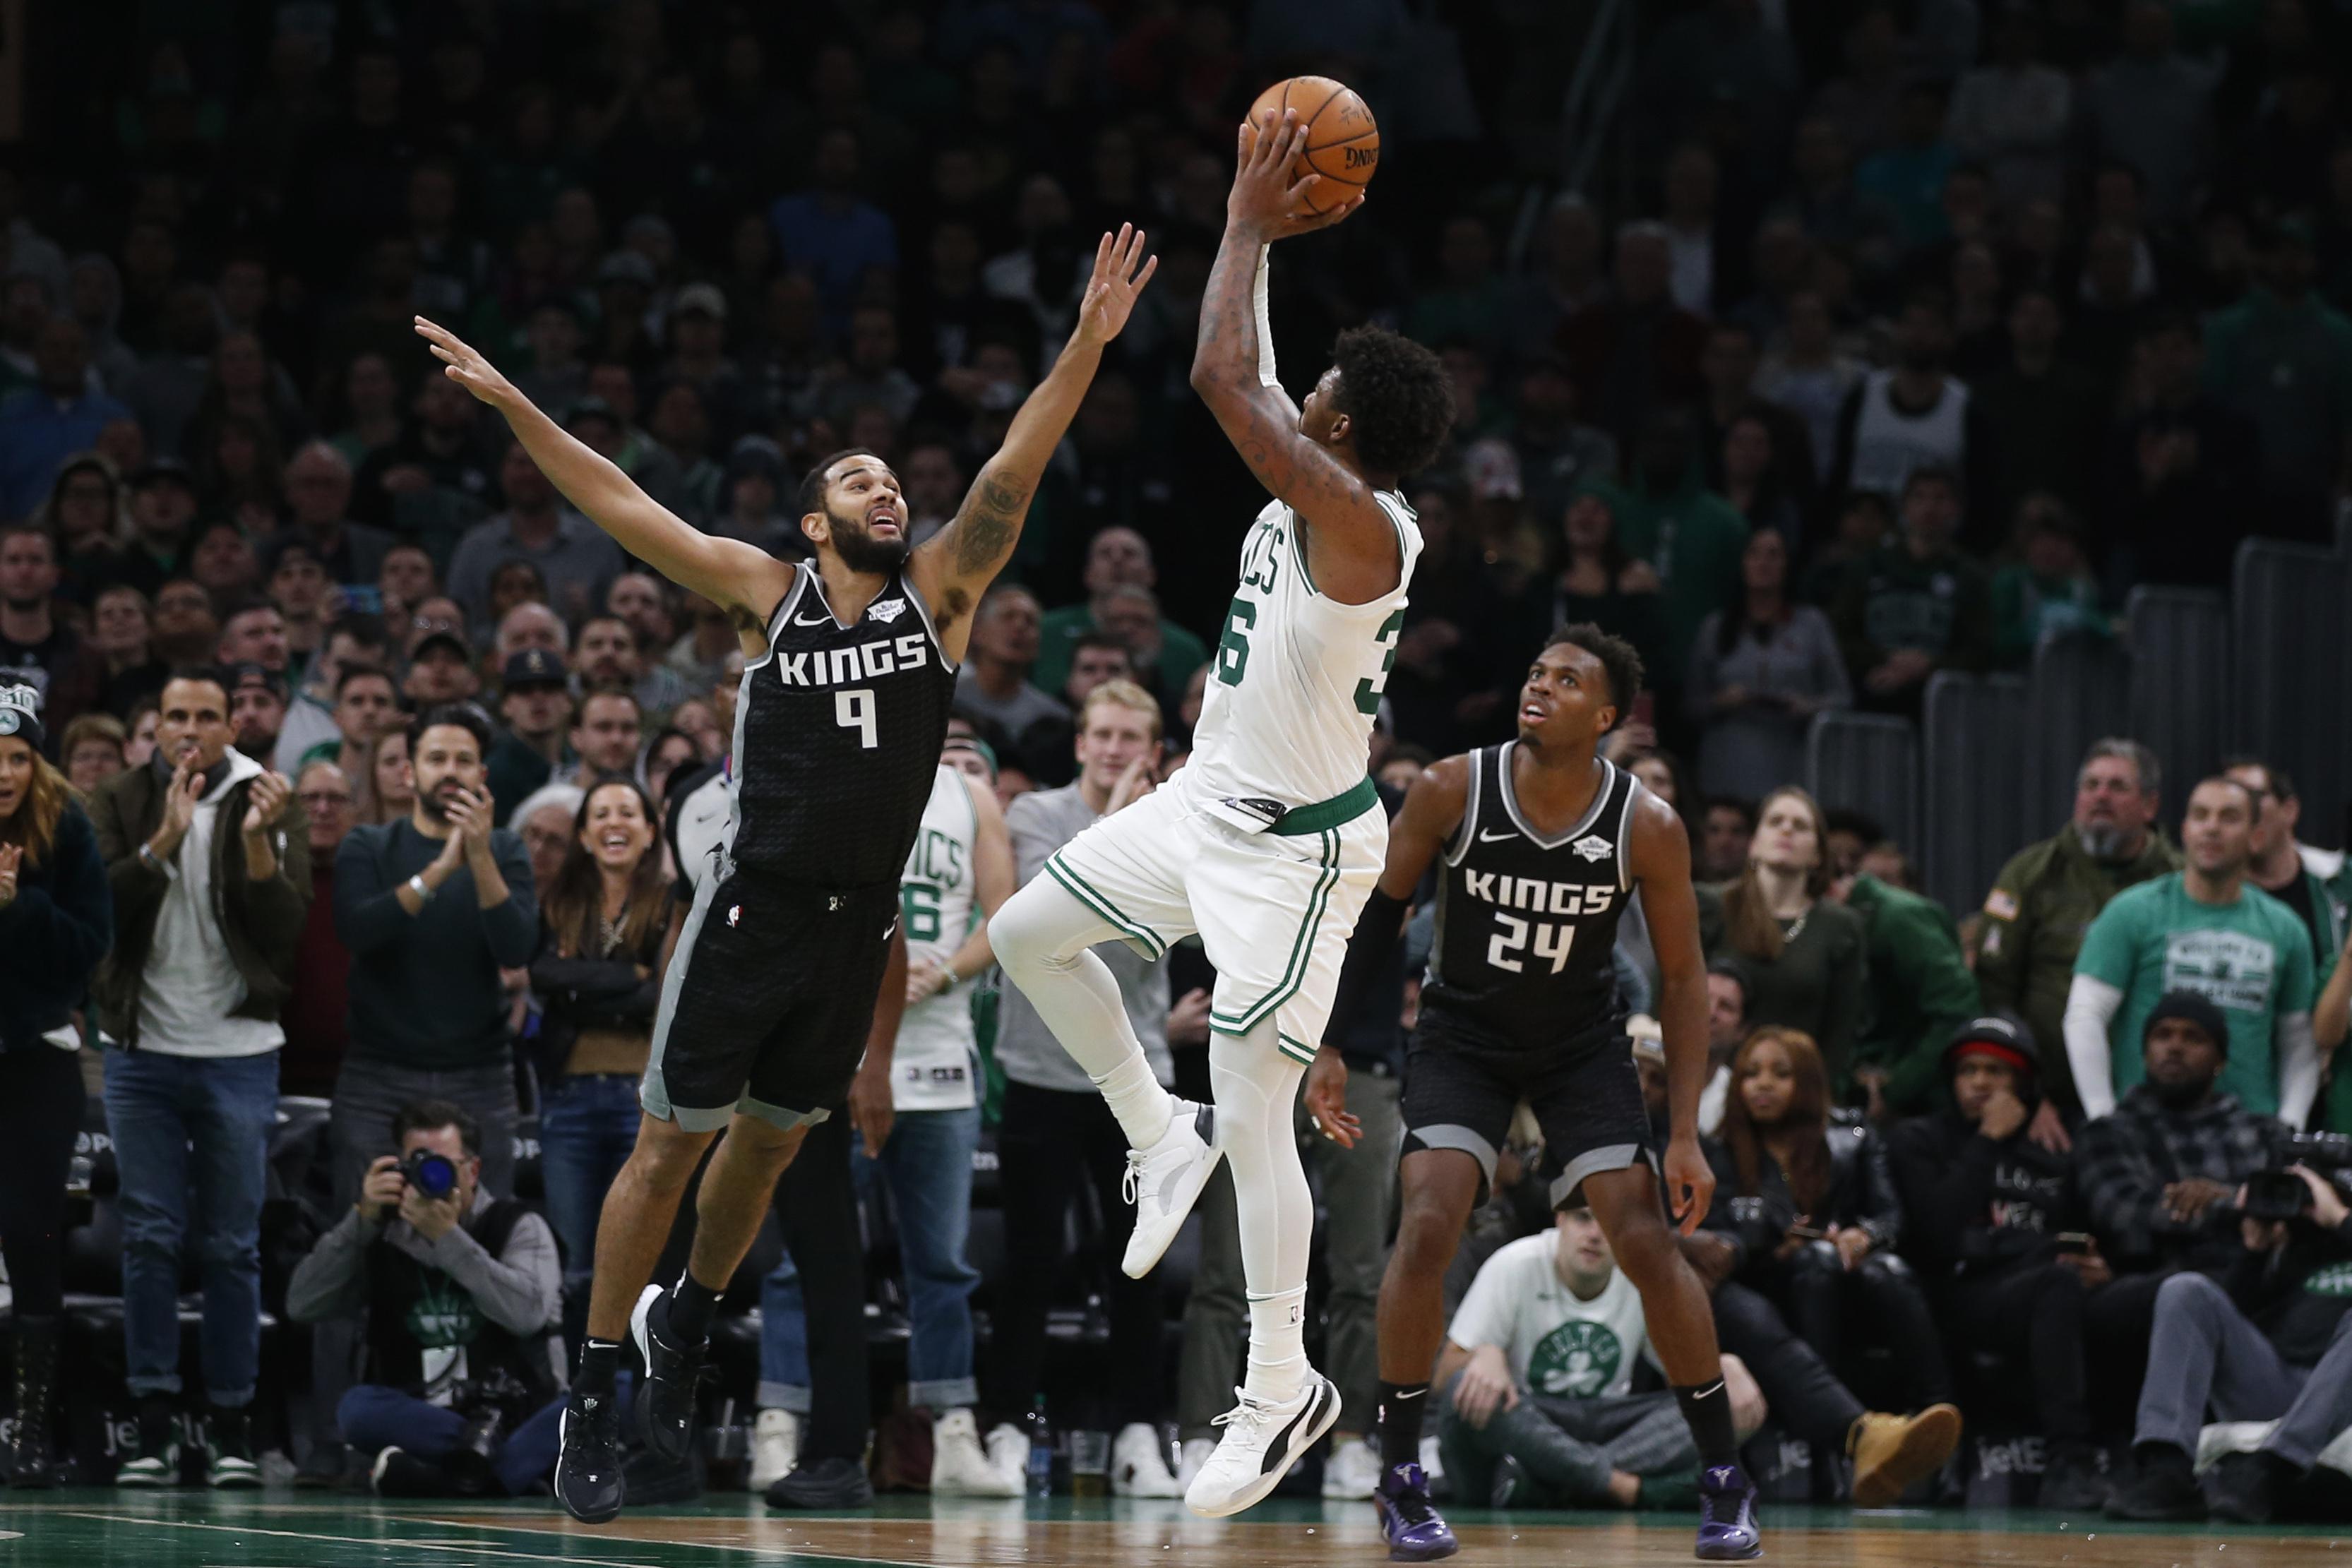 Celtics hold off Kings 103-102 despite Hield's 41 points